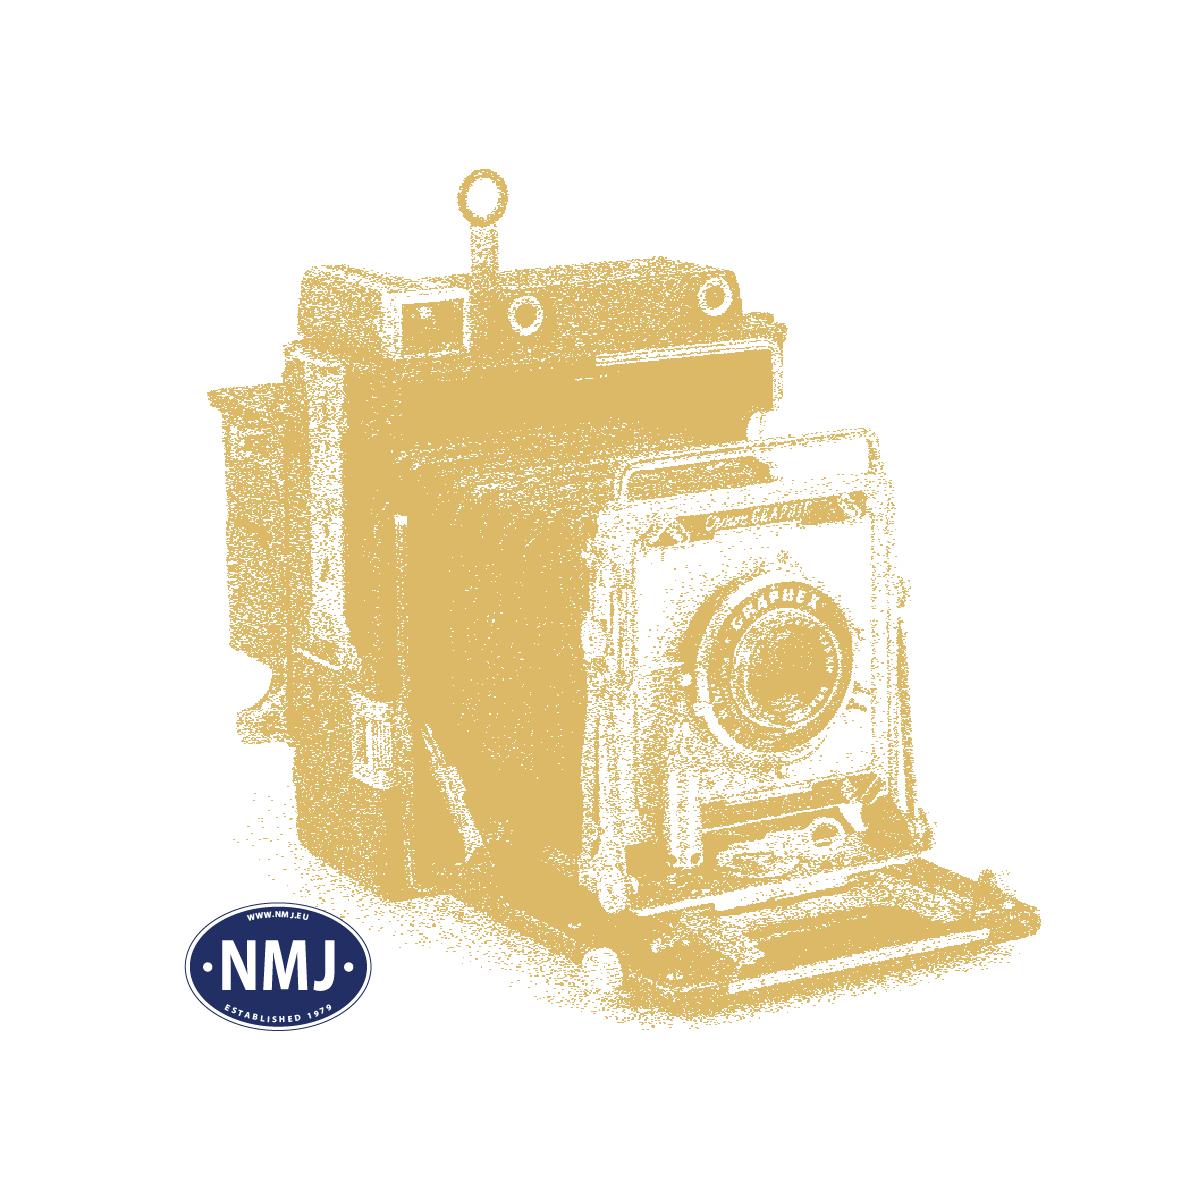 NMJT145001 - NMJ Topline NSB Di3b 641, Red/Brown Livery, 0-Scale 1:45